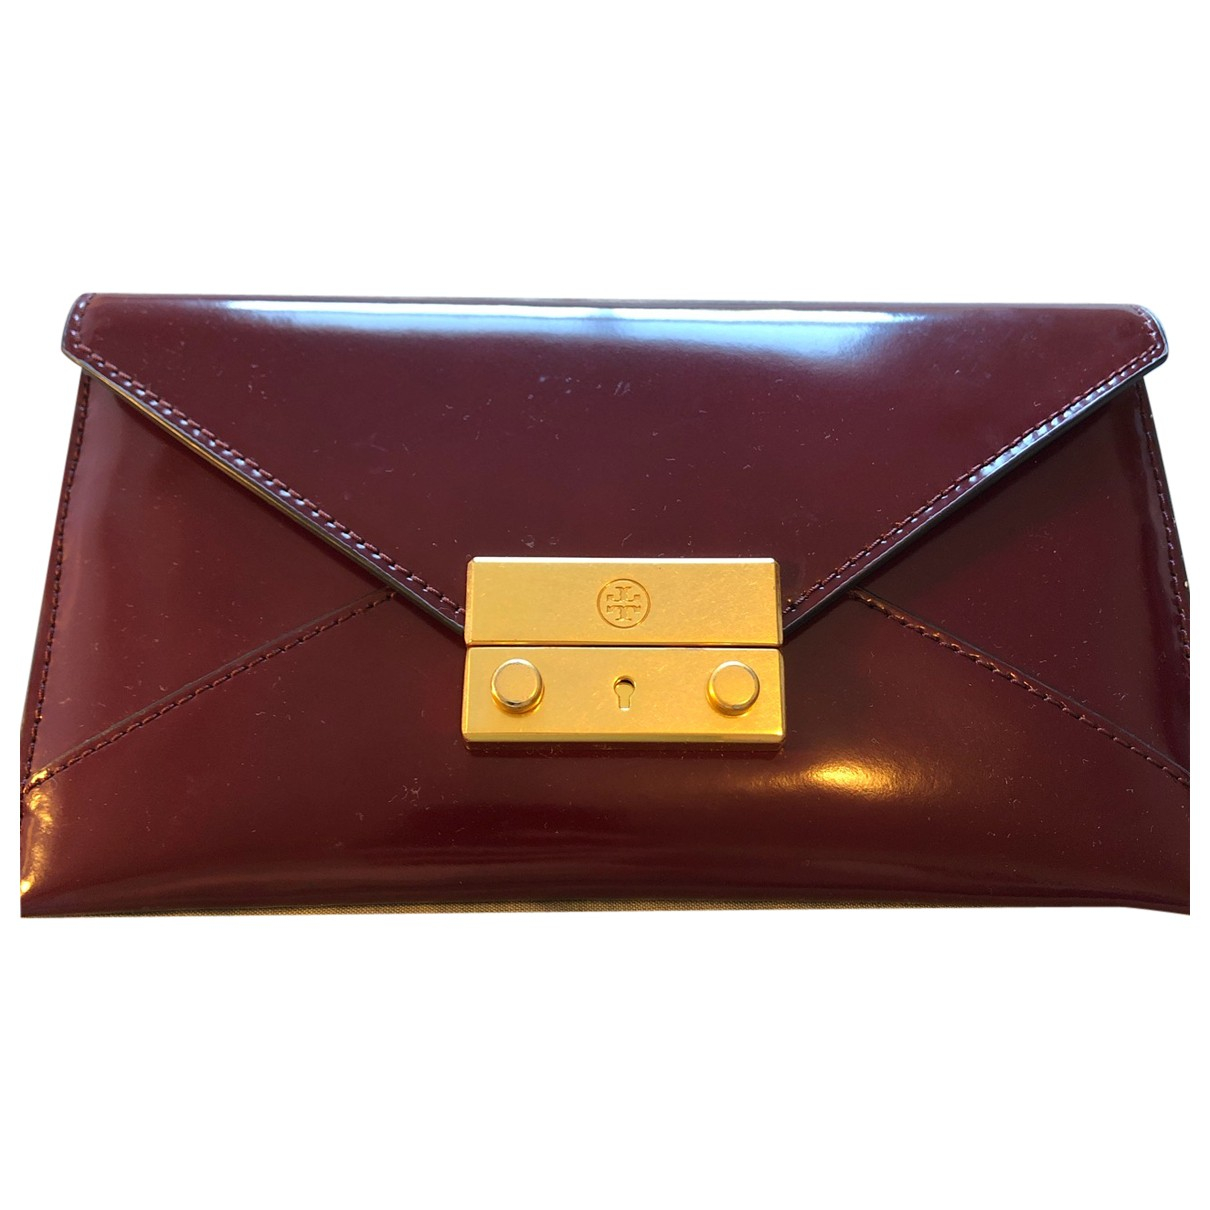 Tory Burch \N Burgundy Leather wallet for Women \N